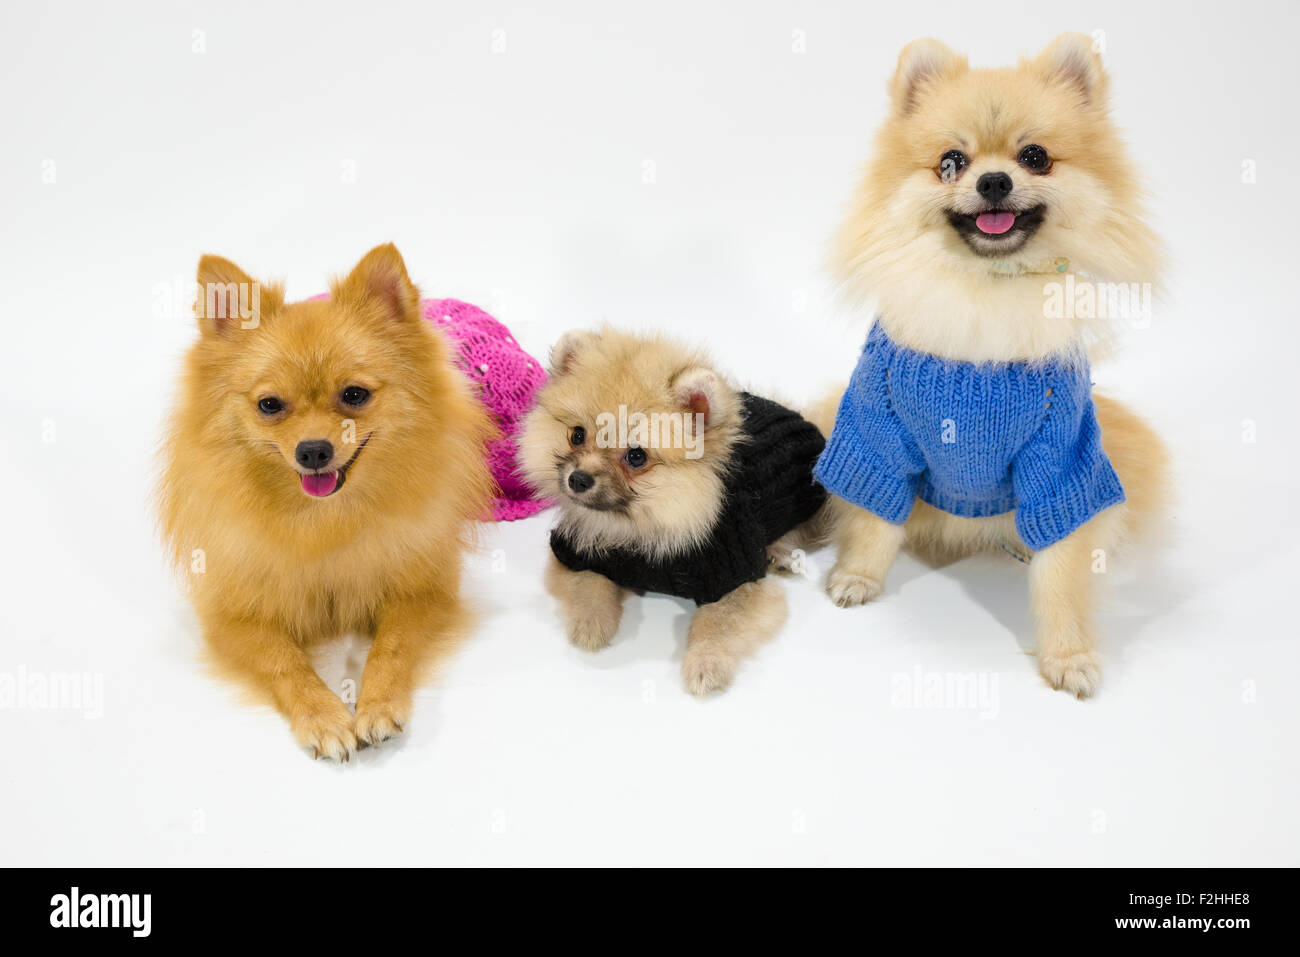 Pomeranian Family at Studio - Stock Image